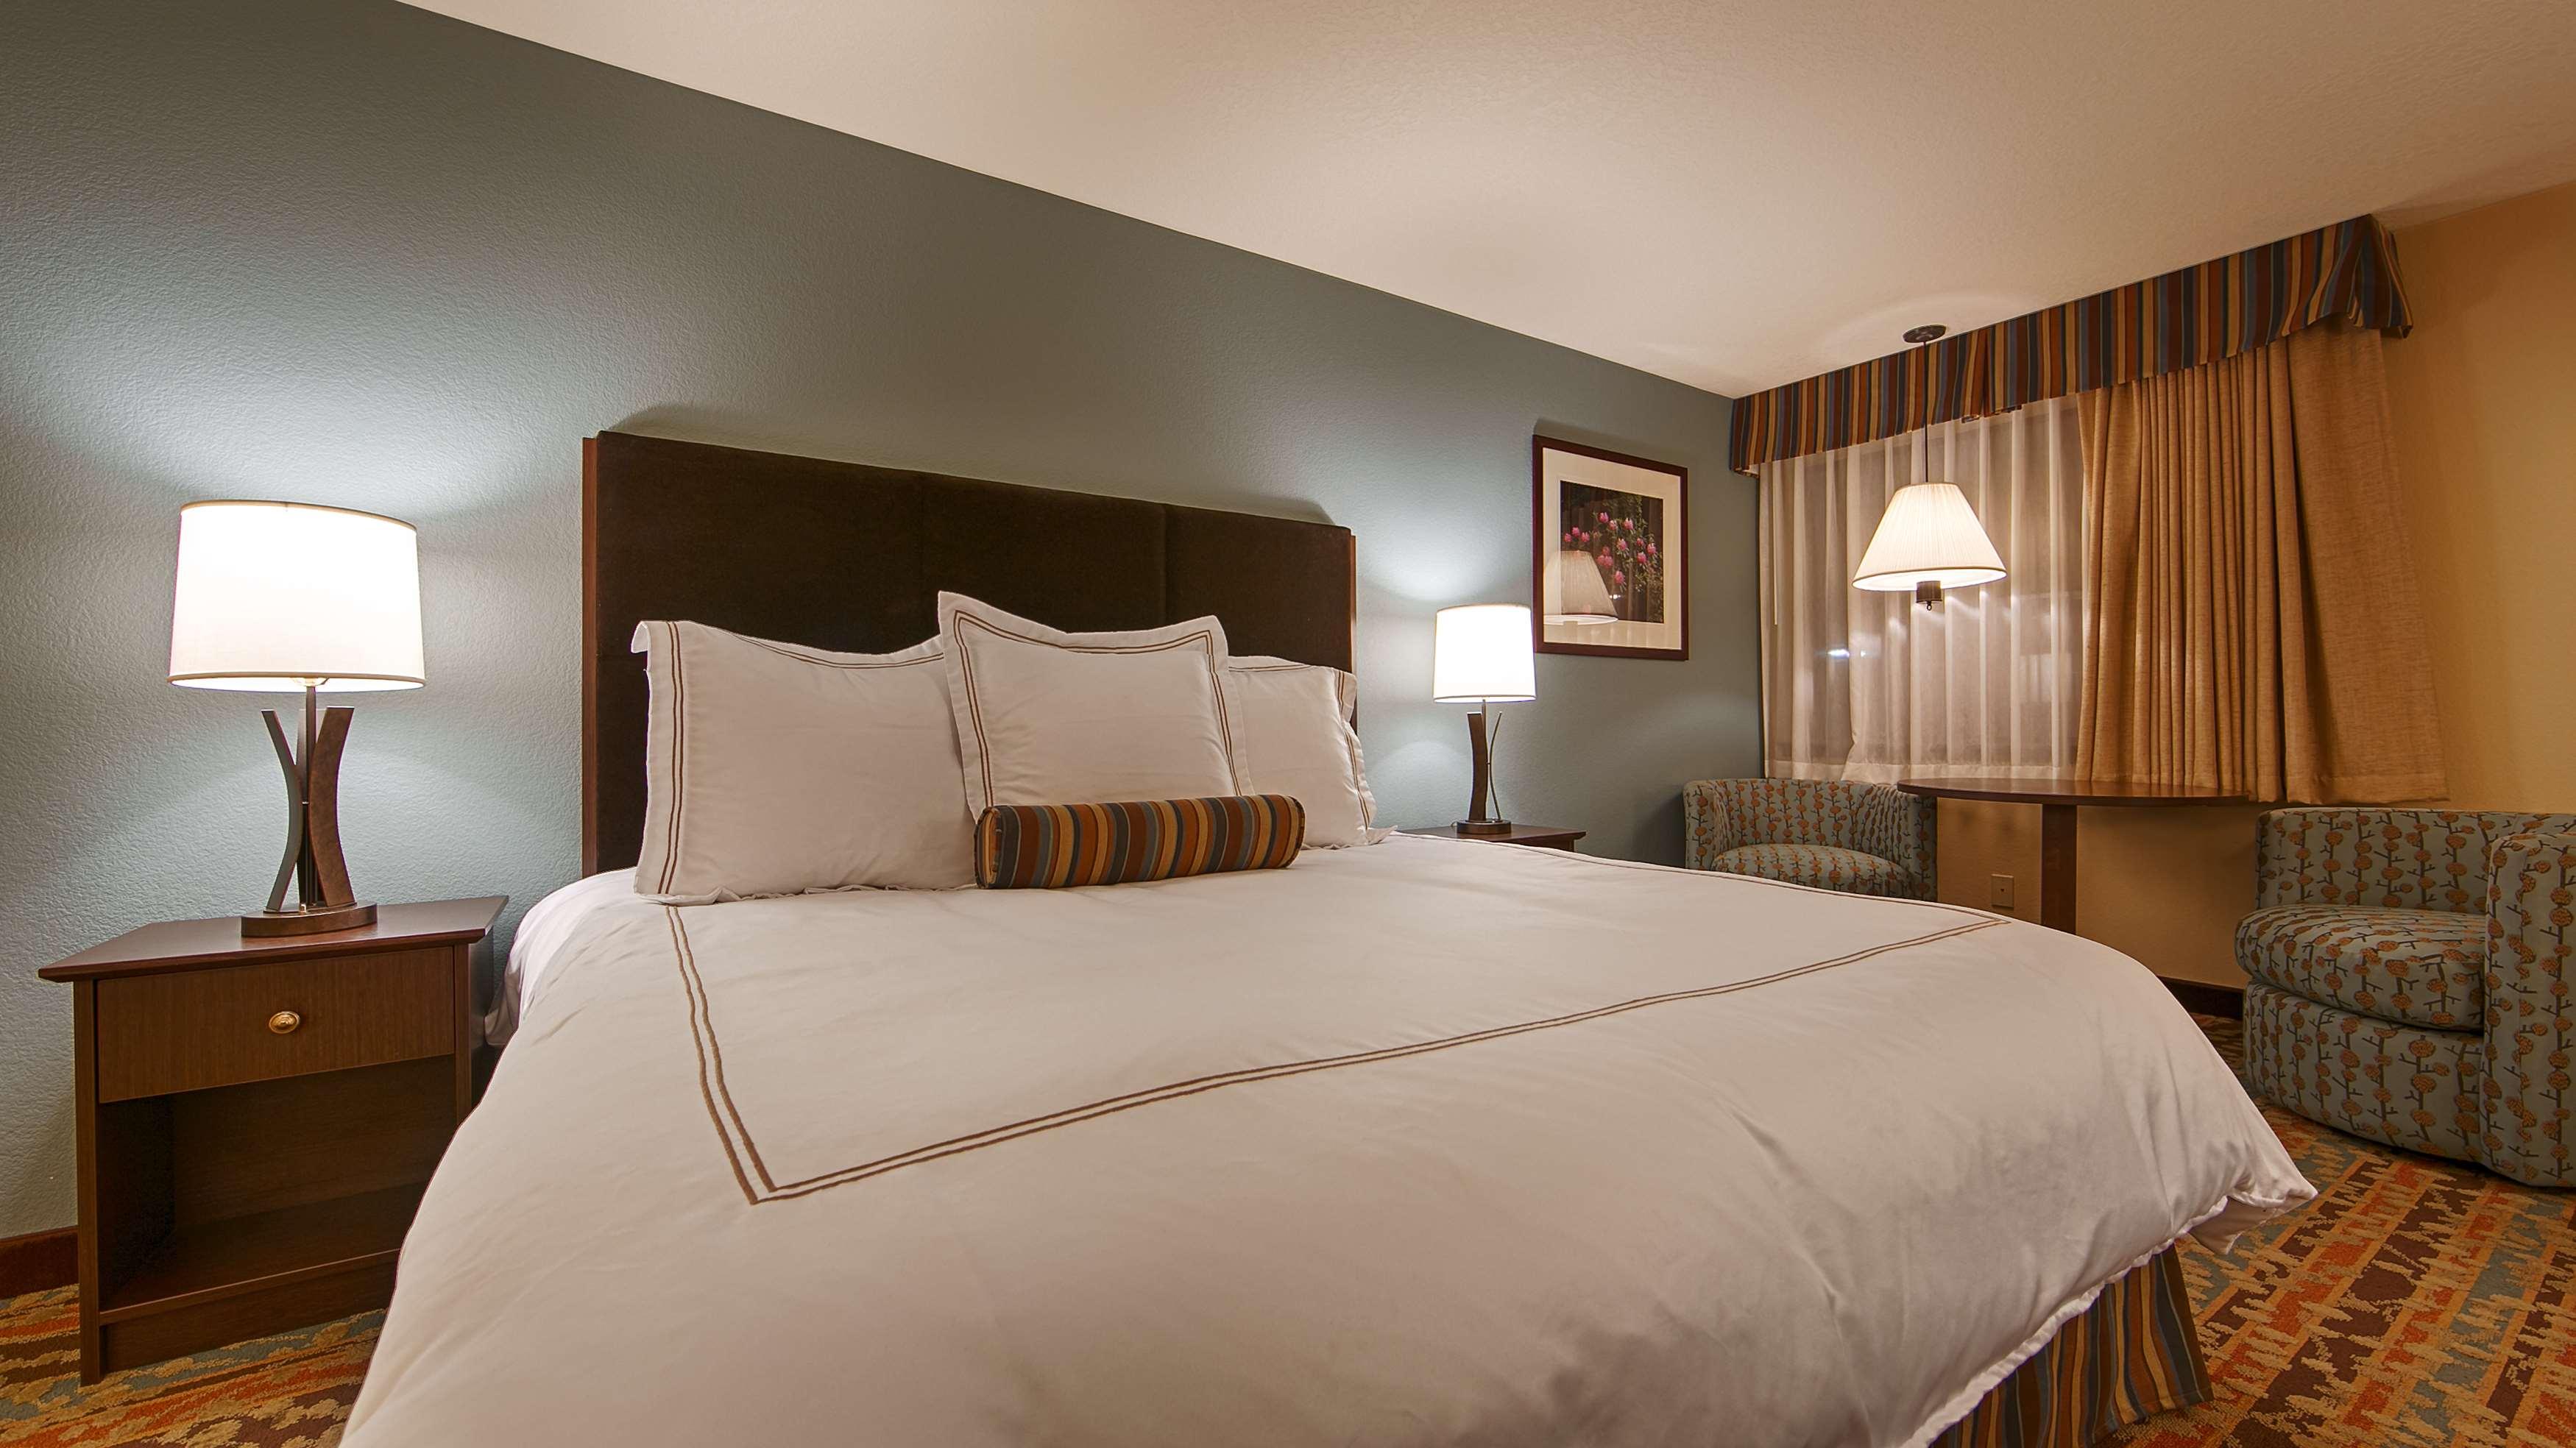 Best Western Windsor Inn image 10